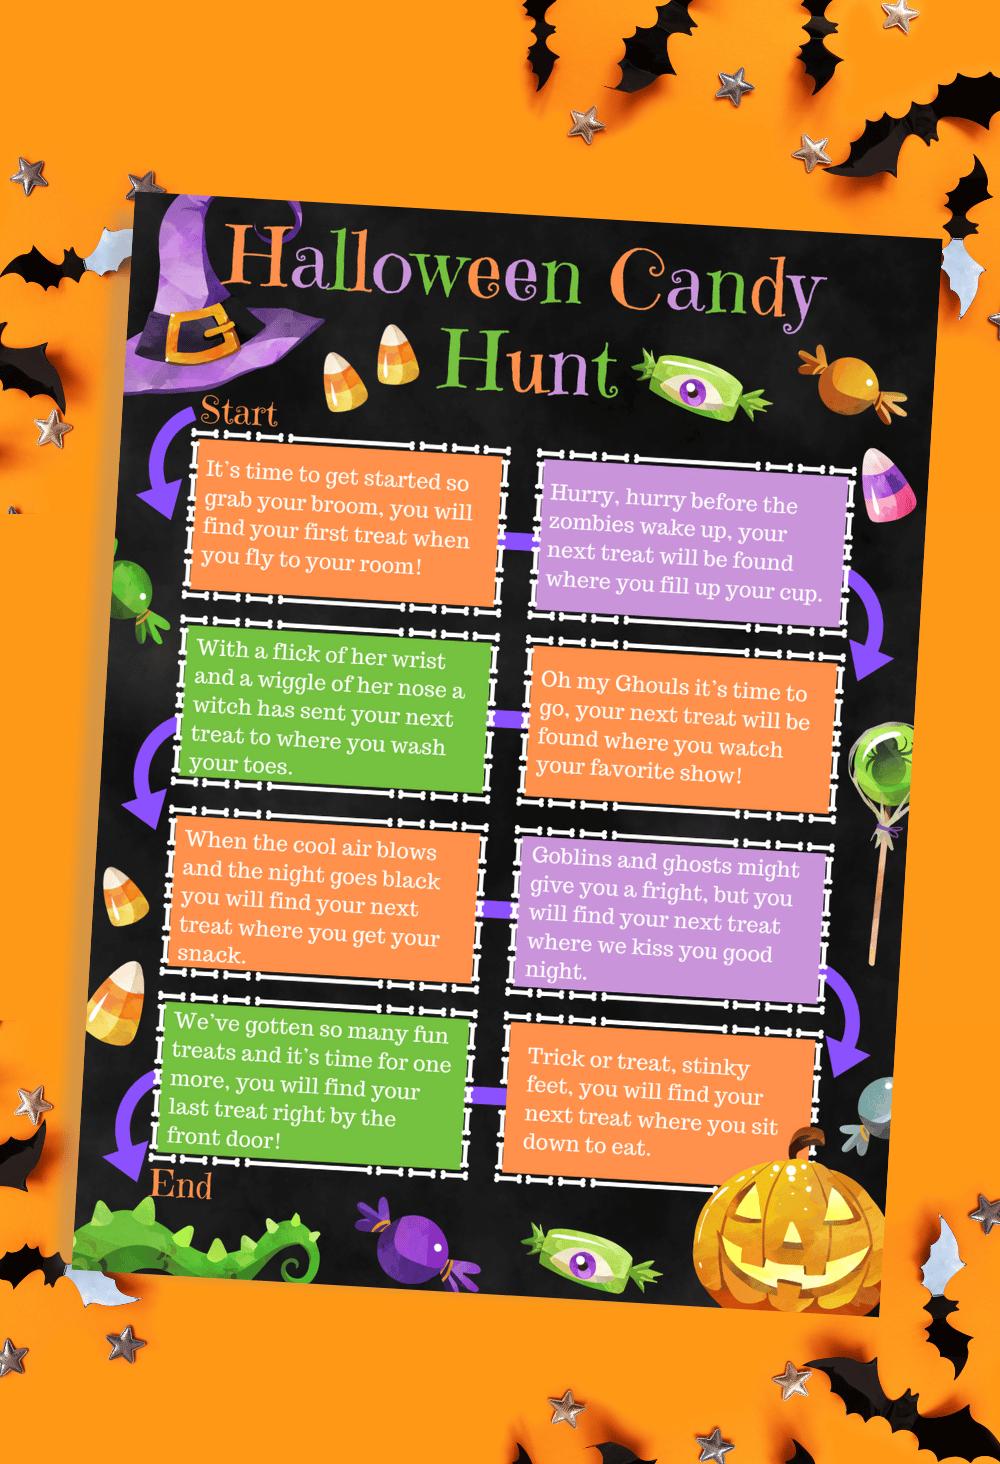 Halloween Candy Hunt Game Free Printable